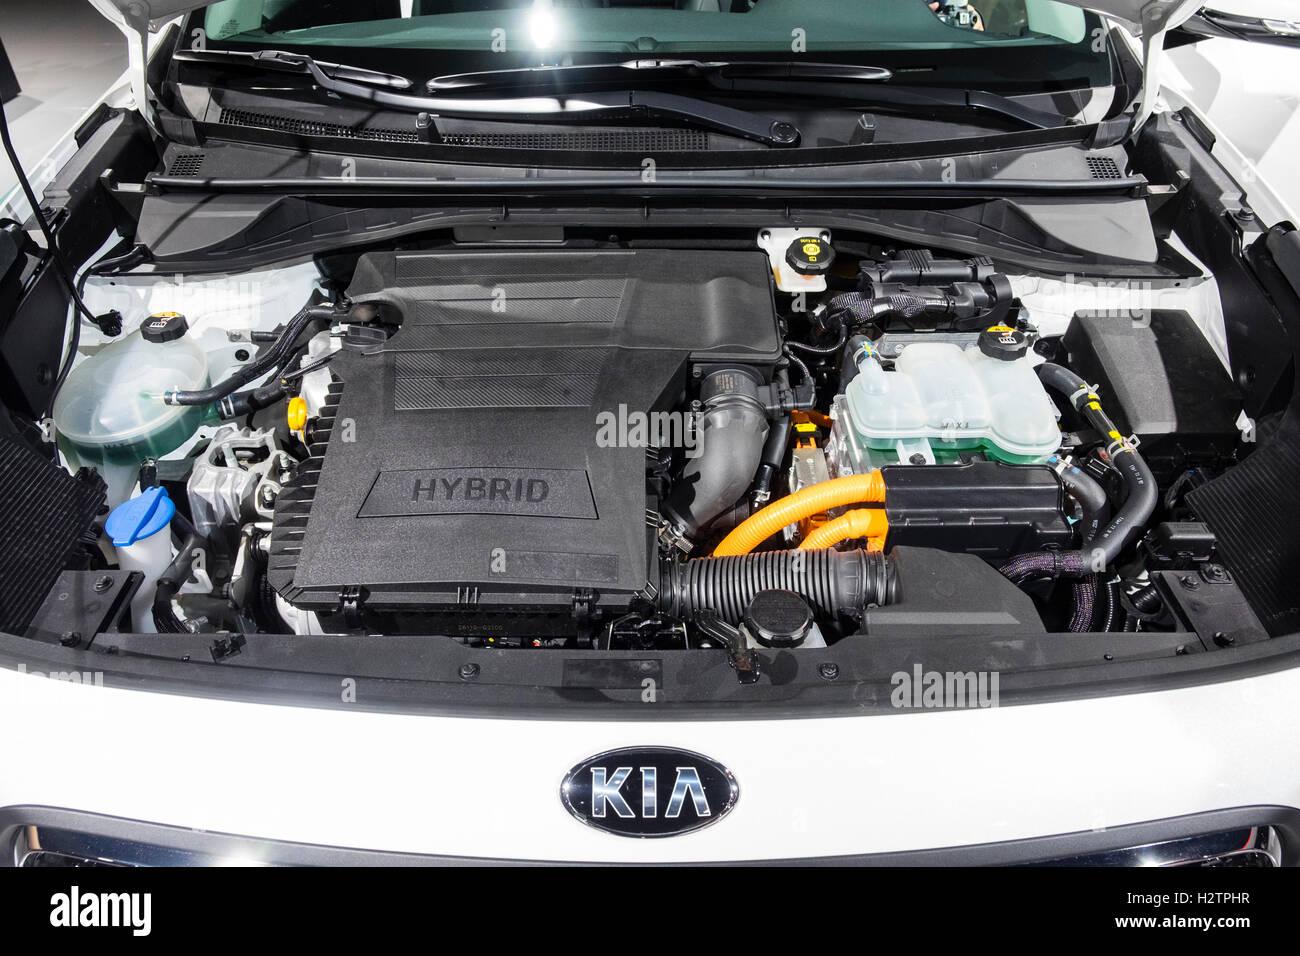 Detail of Kia Niro Hybrid engine at Paris Motor Show 2016 - Stock Image